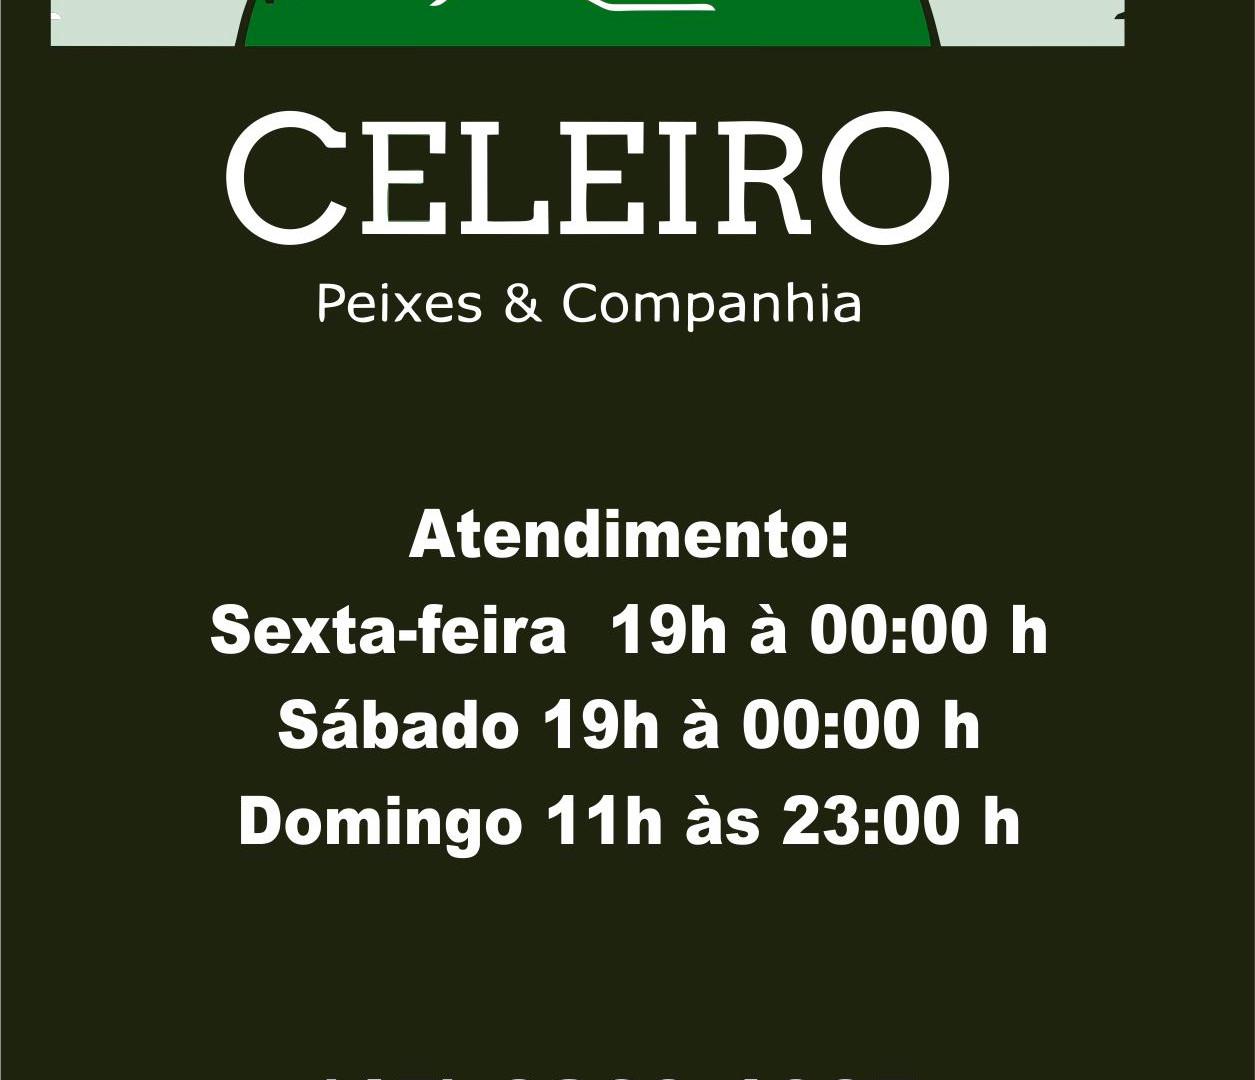 Celeiro.jpg